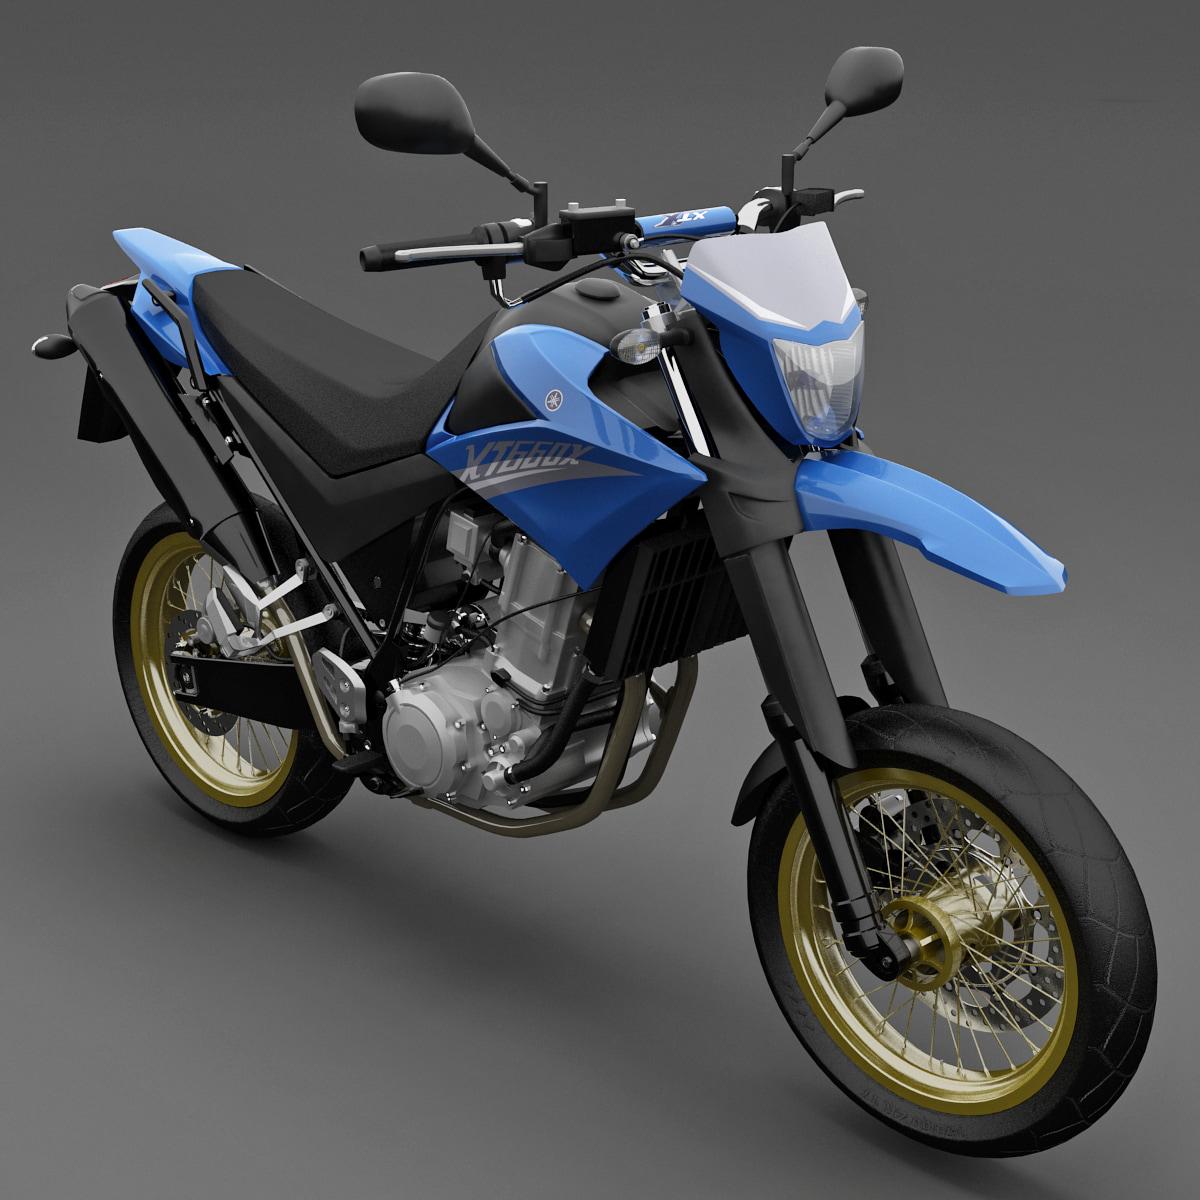 Yamaha_XT_660_X_max_0001.jpg